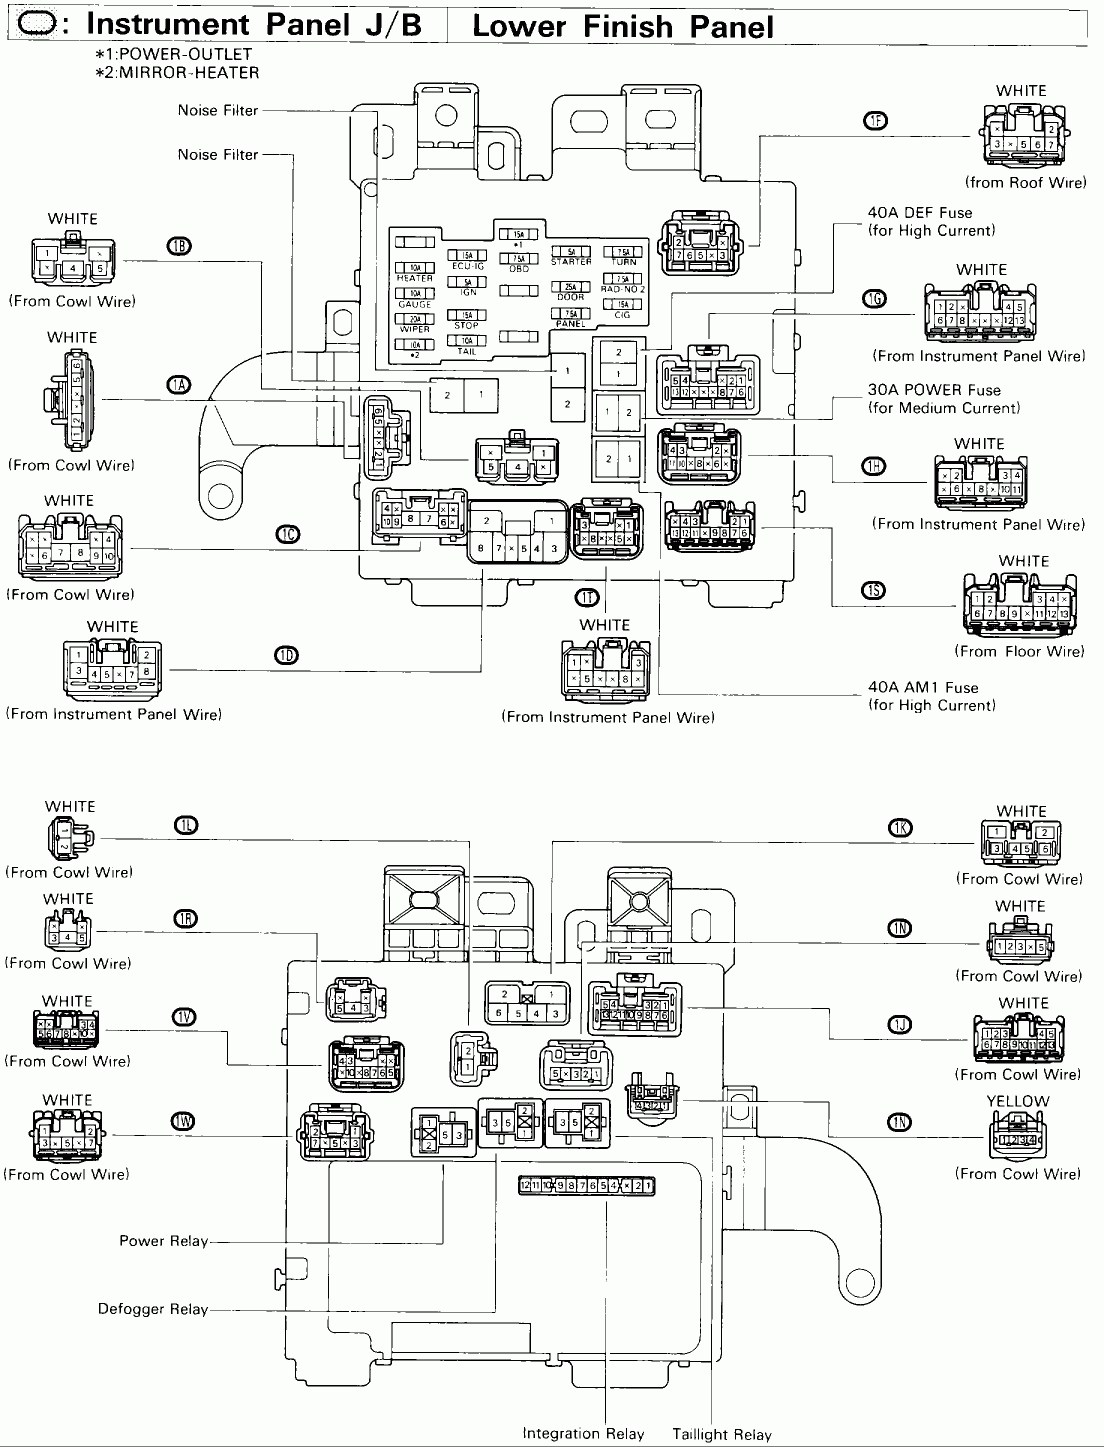 [AZ_7486] Fuse Box Diagram 1995 Zx 600R Download Diagram